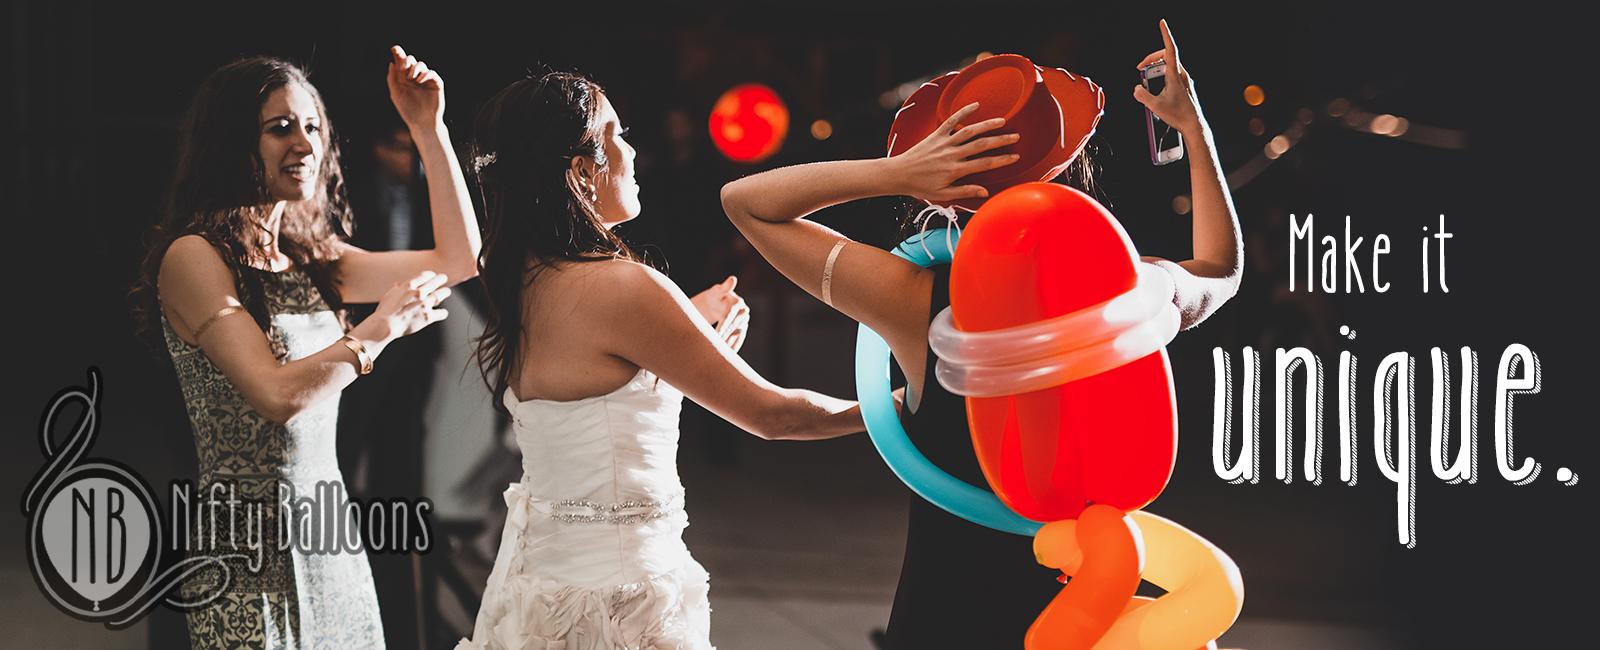 Bride+JetpackBanner.jpg